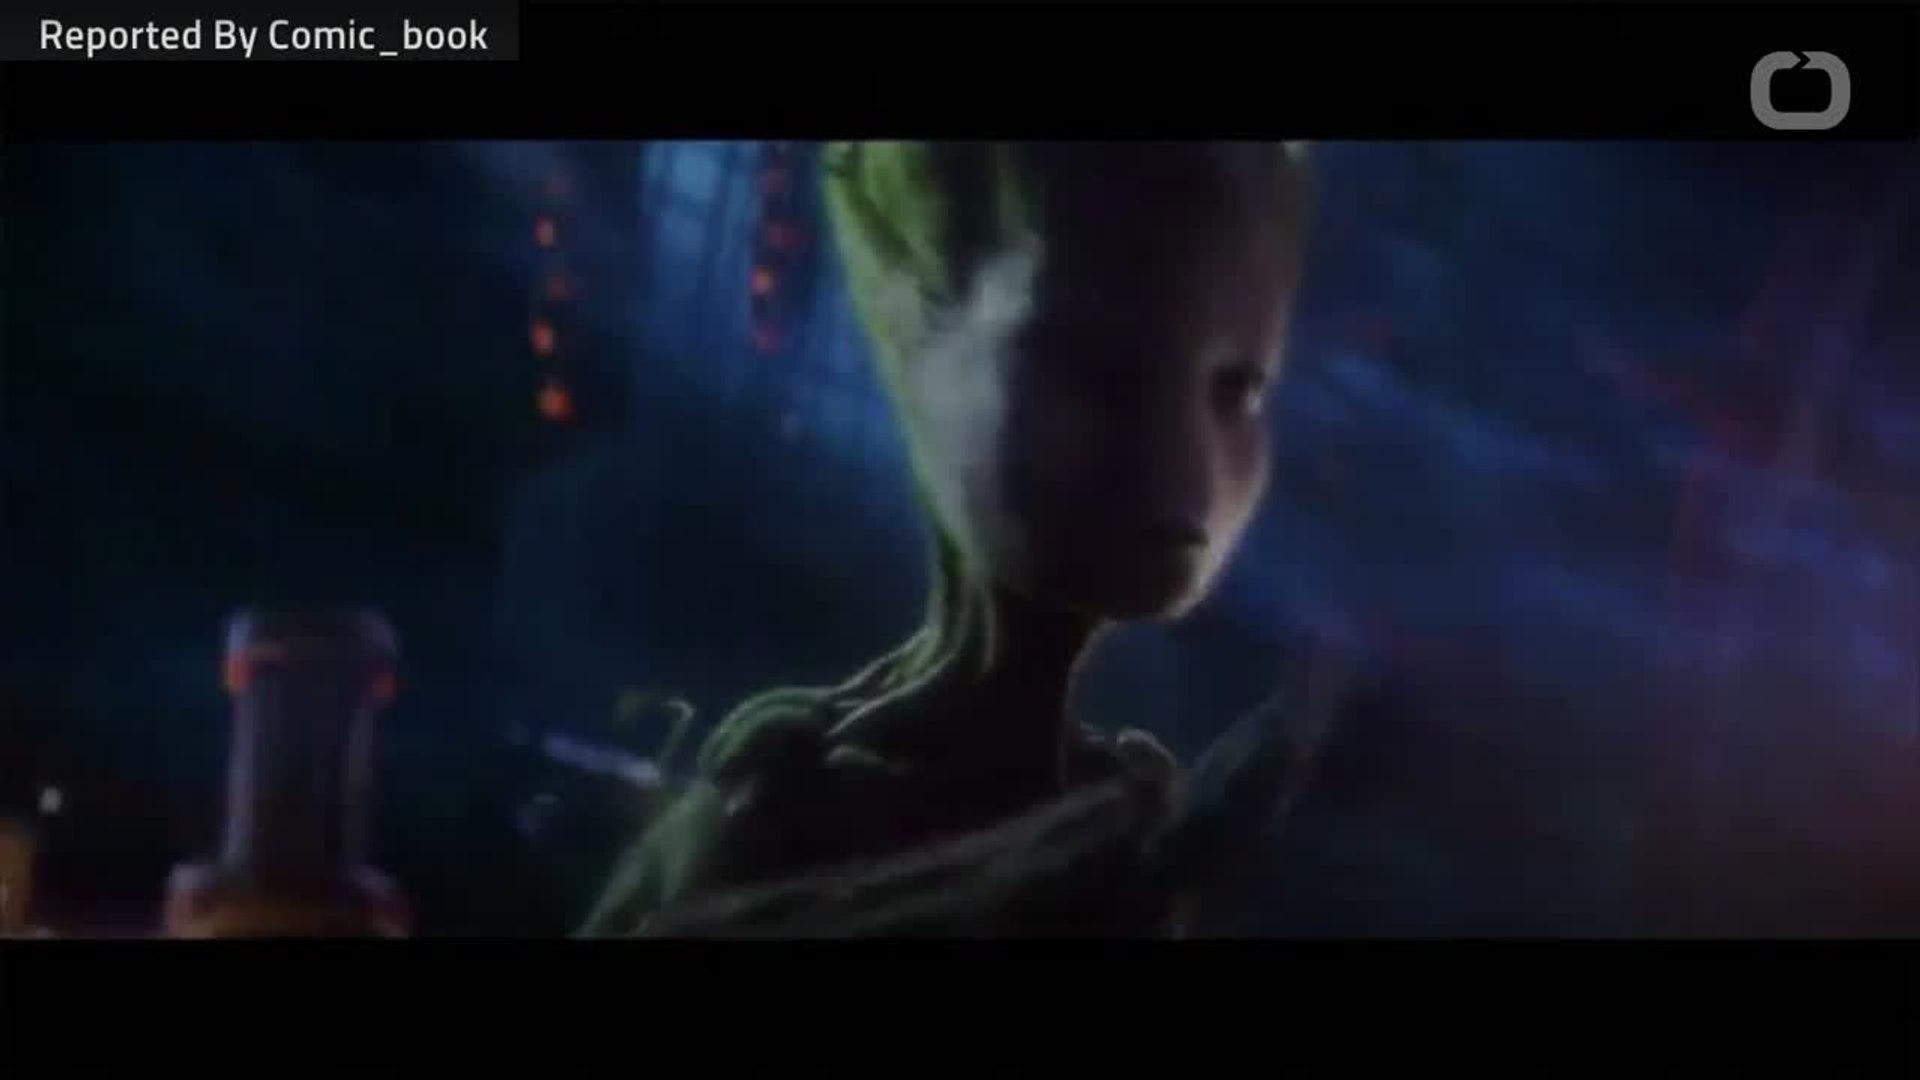 'Avengers 4' Promo Artwork Reveals an Upgraded War Machine